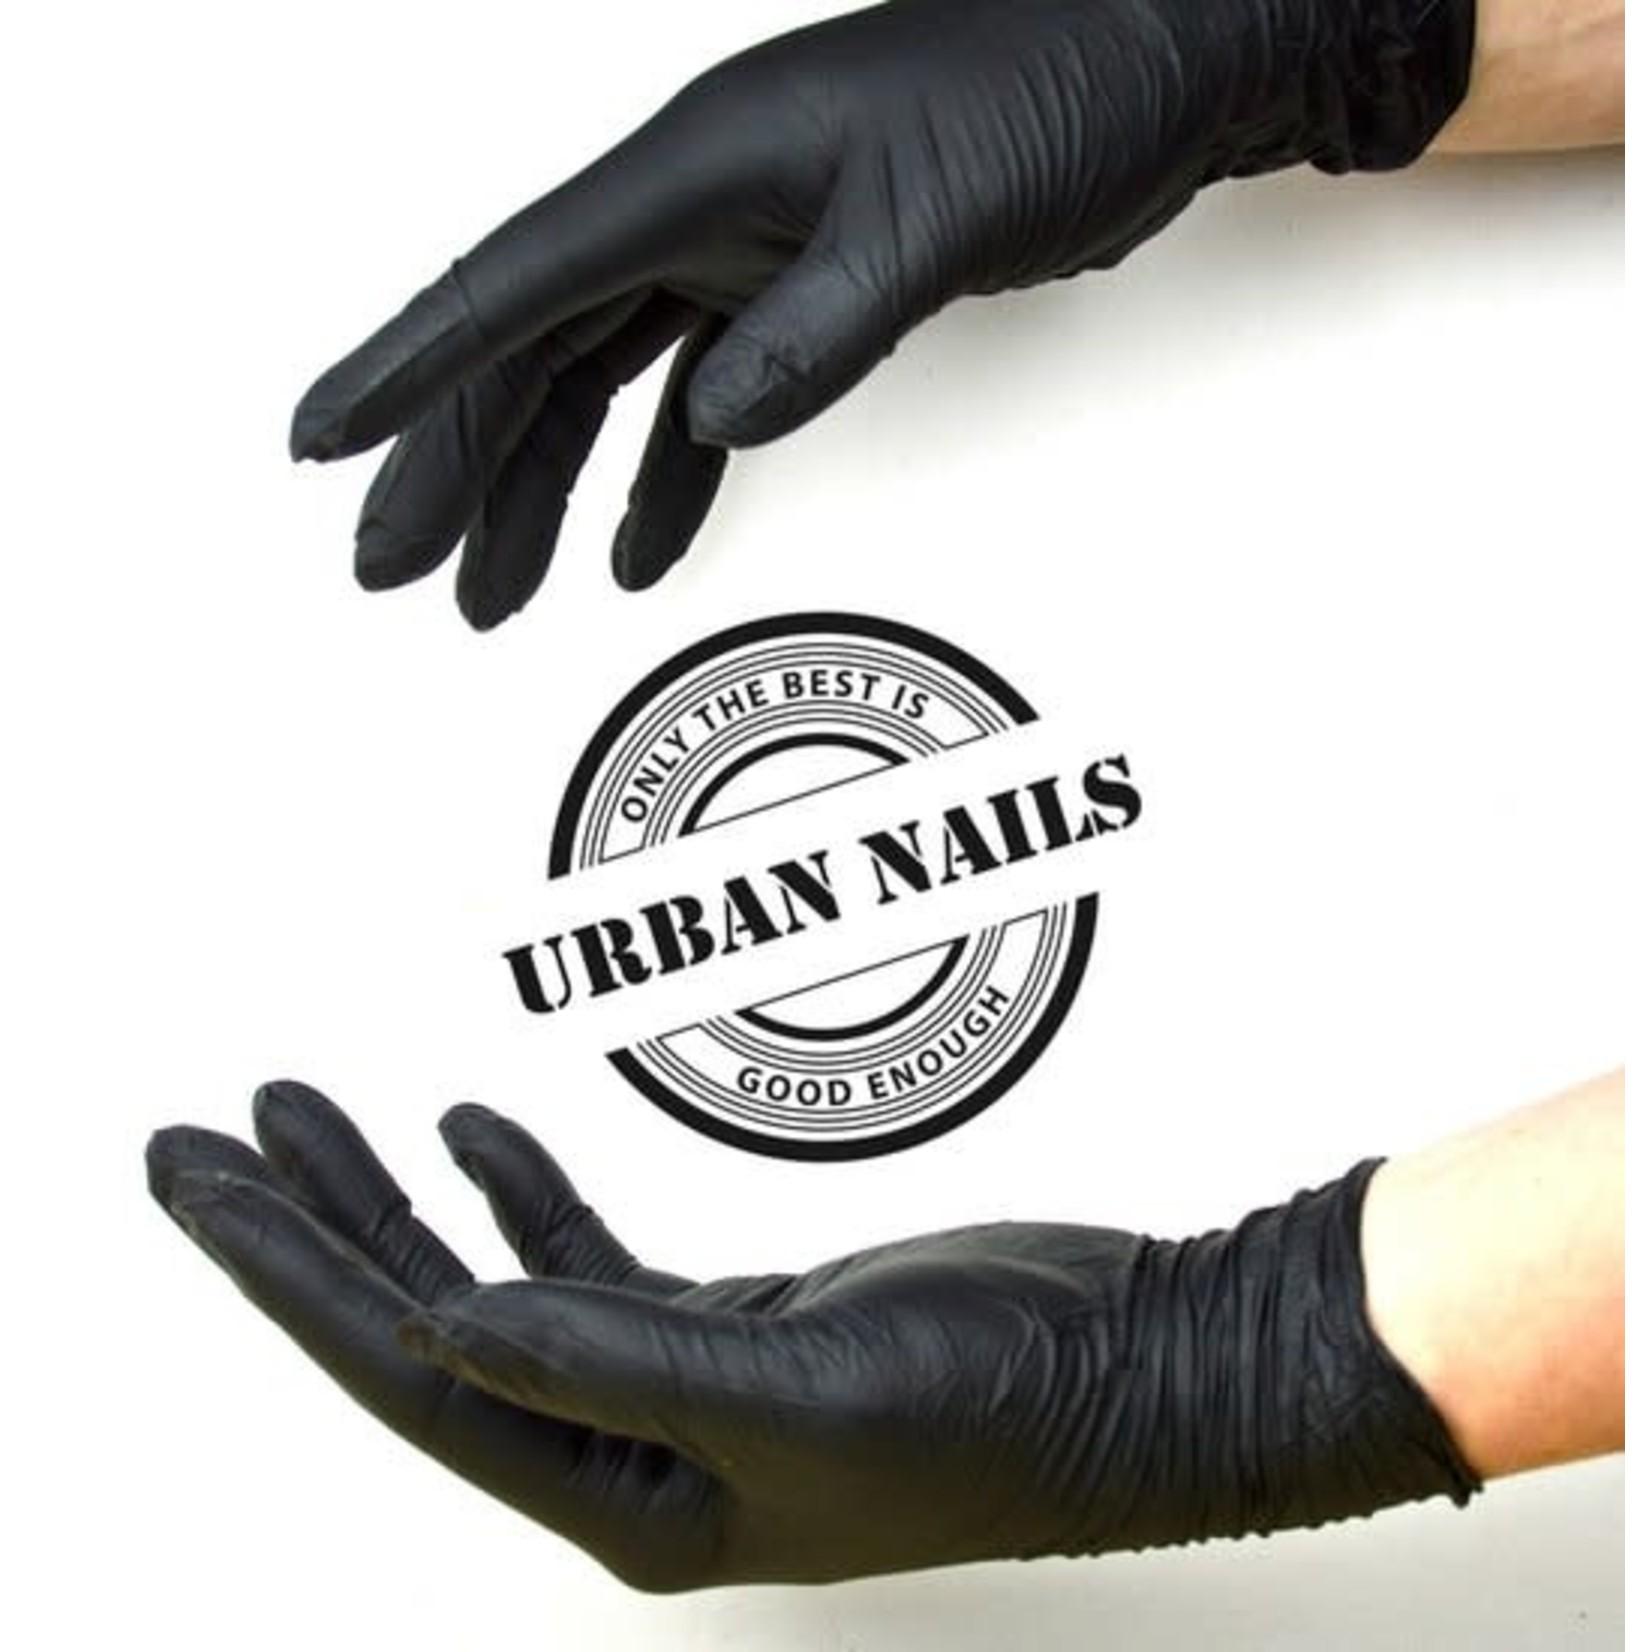 Urban Nails Handschoenen Zwart Nitrill